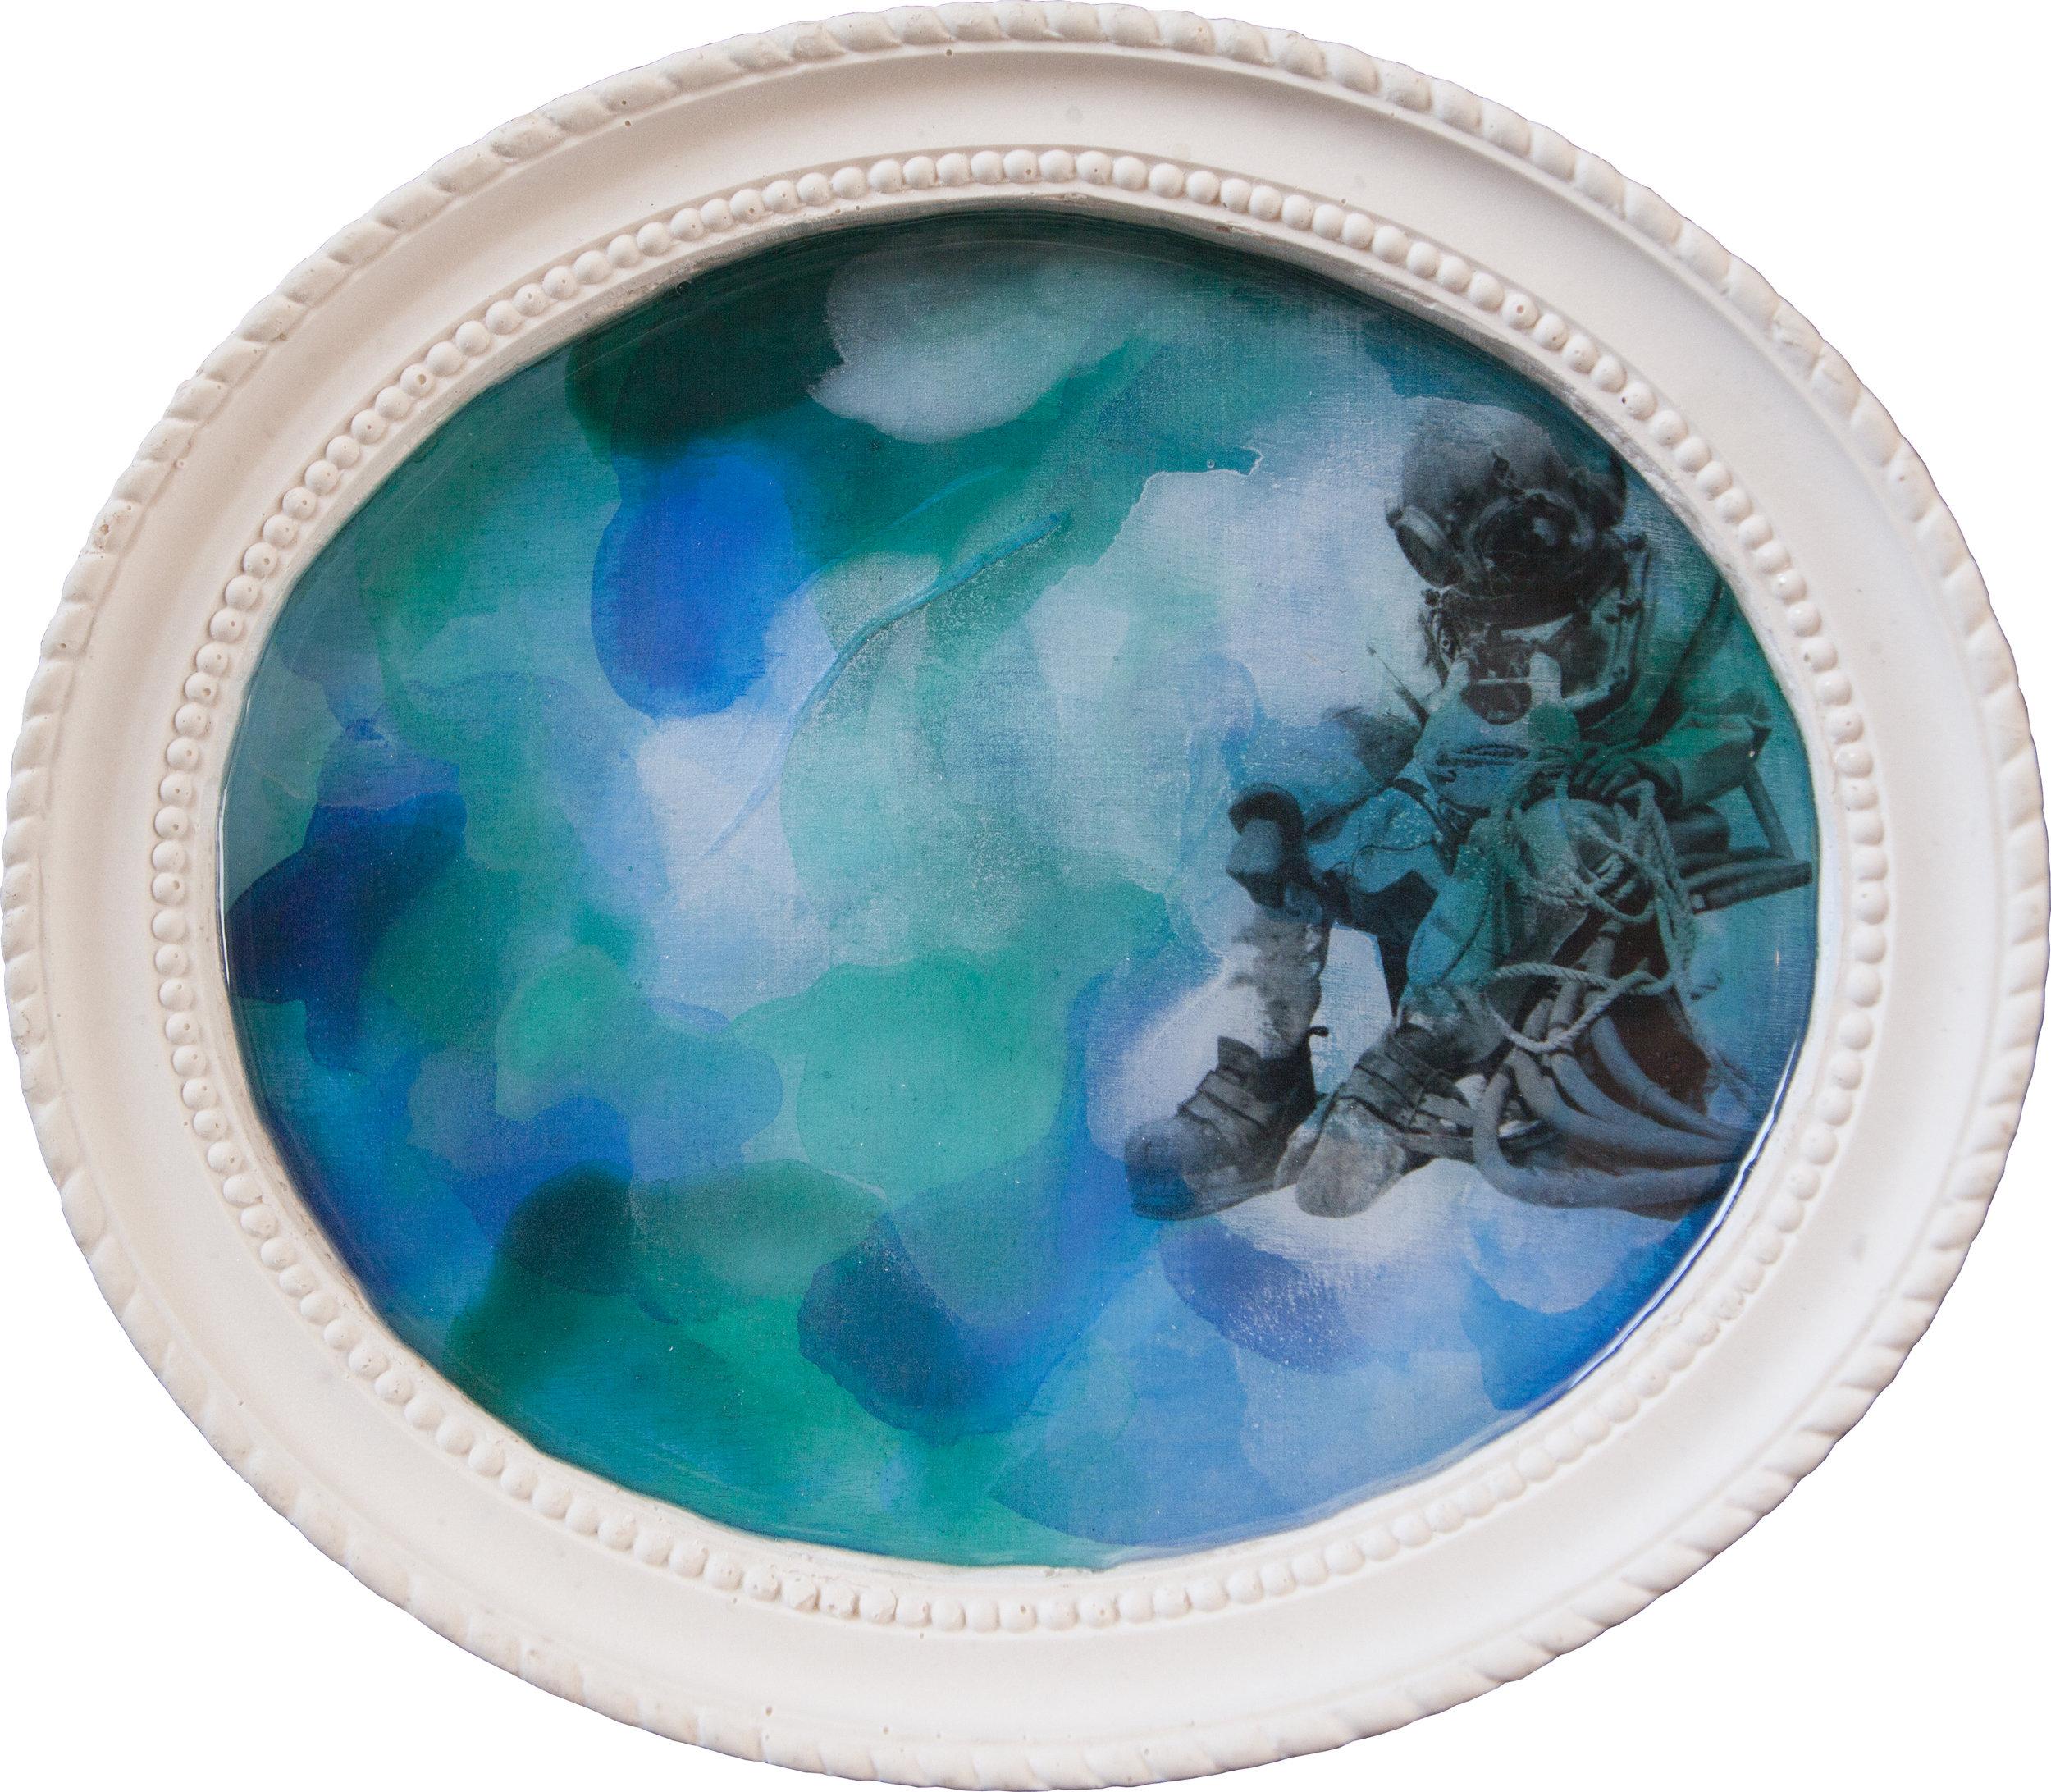 Shiraz Bayjoo    Port Hole No.2 Oyster Diver    Acrylic on wood, resin, jesmonite  27 x 23 x 3 cm  2017